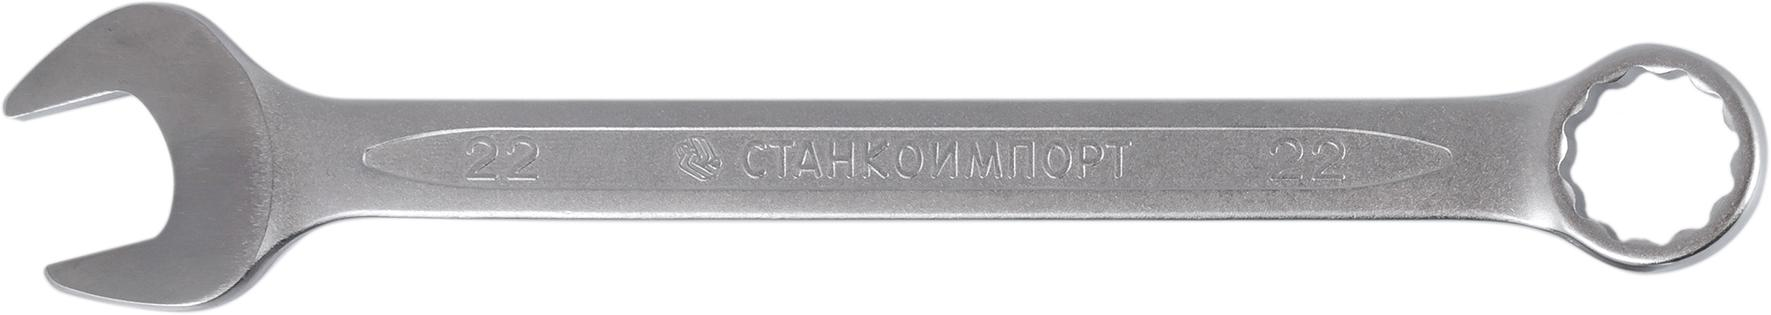 Ключ гаечный СТАНКОИМПОРТ КК.11.30.М8. набор инструмента станкоимпорт нг 1 12 42 8